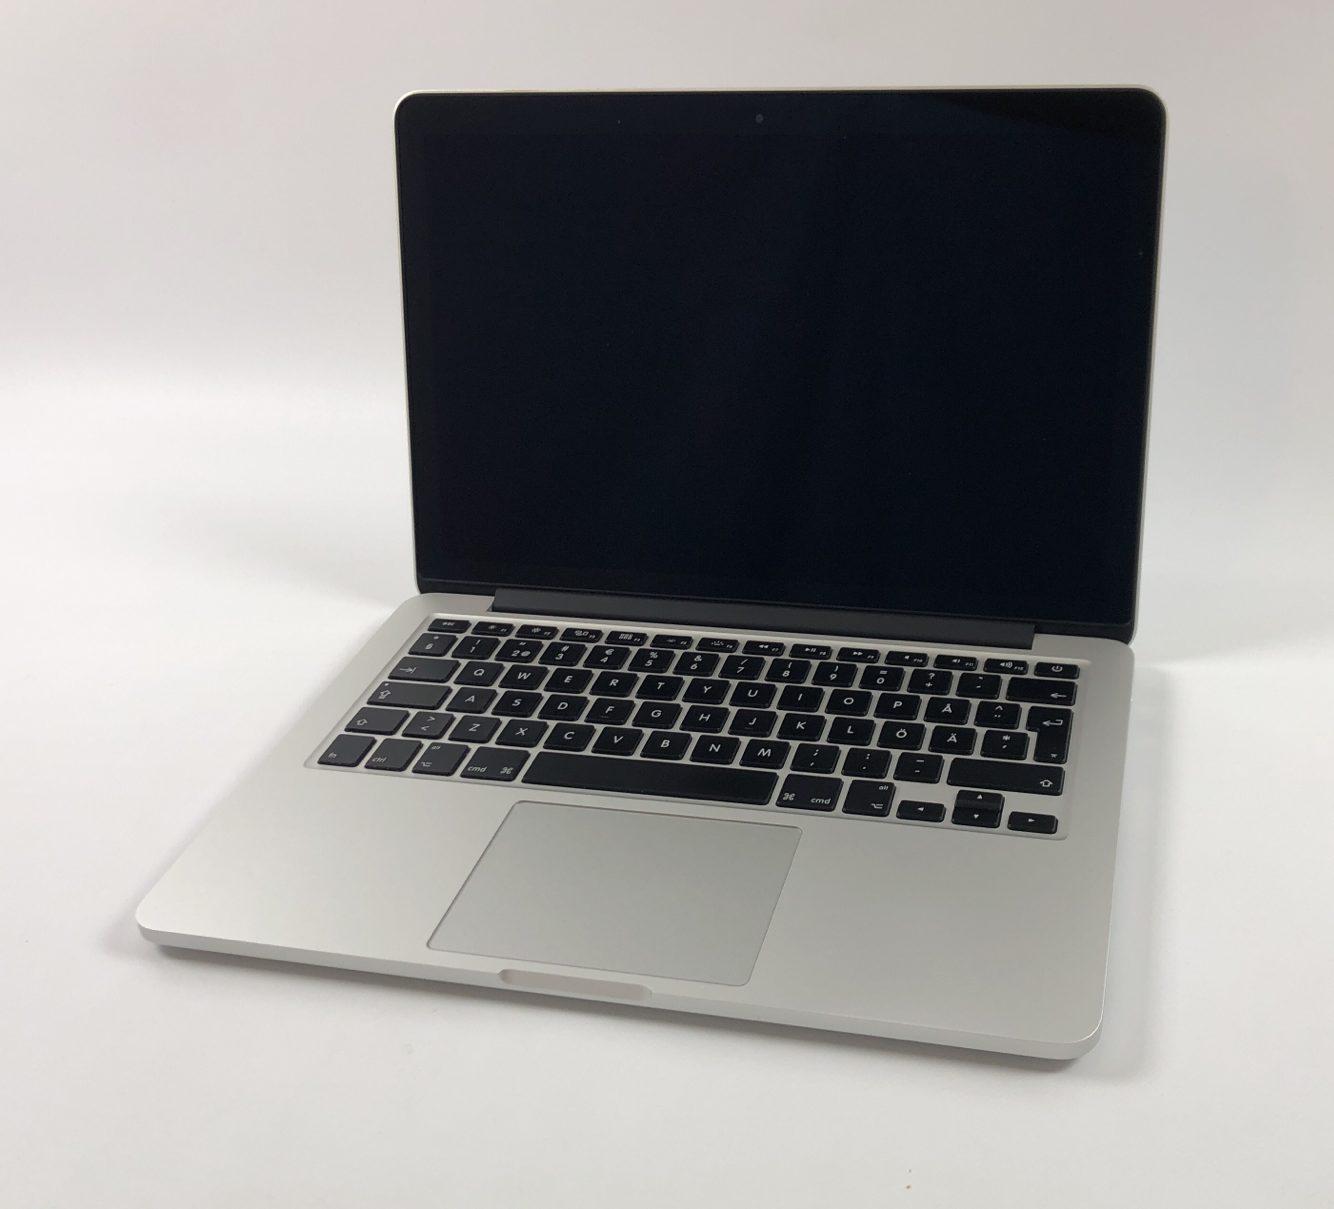 "MacBook Pro Retina 13"" Late 2013 (Intel Core i5 2.4 GHz 8 GB RAM 256 GB SSD), Intel Core i5 2.4 GHz, 8 GB RAM, 256 GB SSD, Kuva 1"